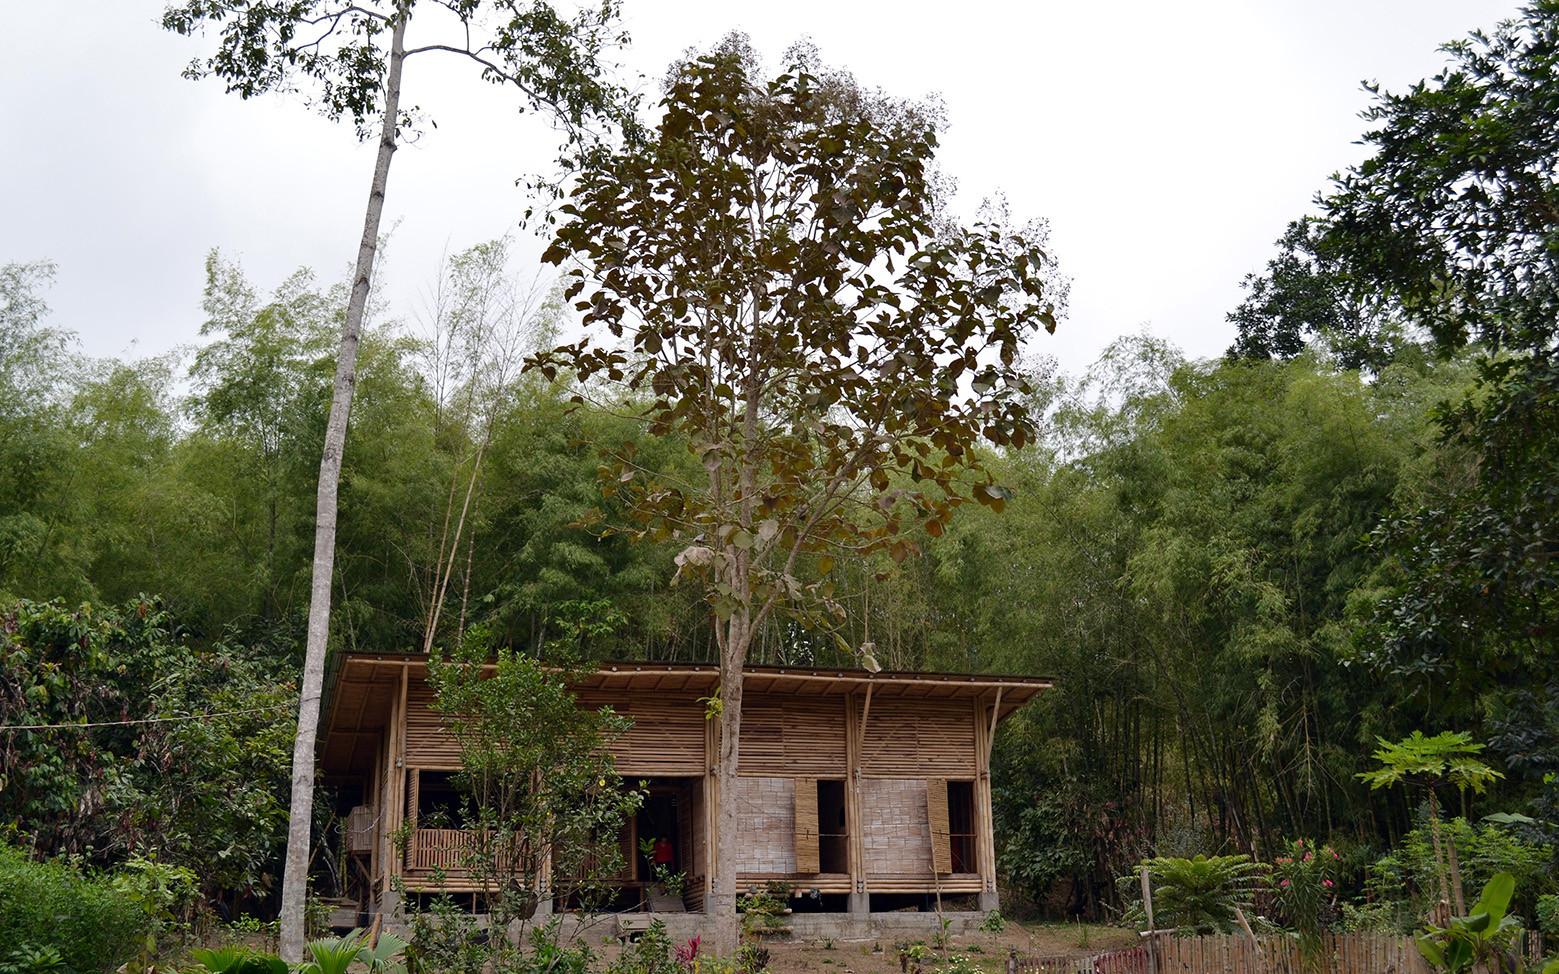 Galeria de casa convento enrique mora alvarado 6 for Casa con piscina quebrada alvarado